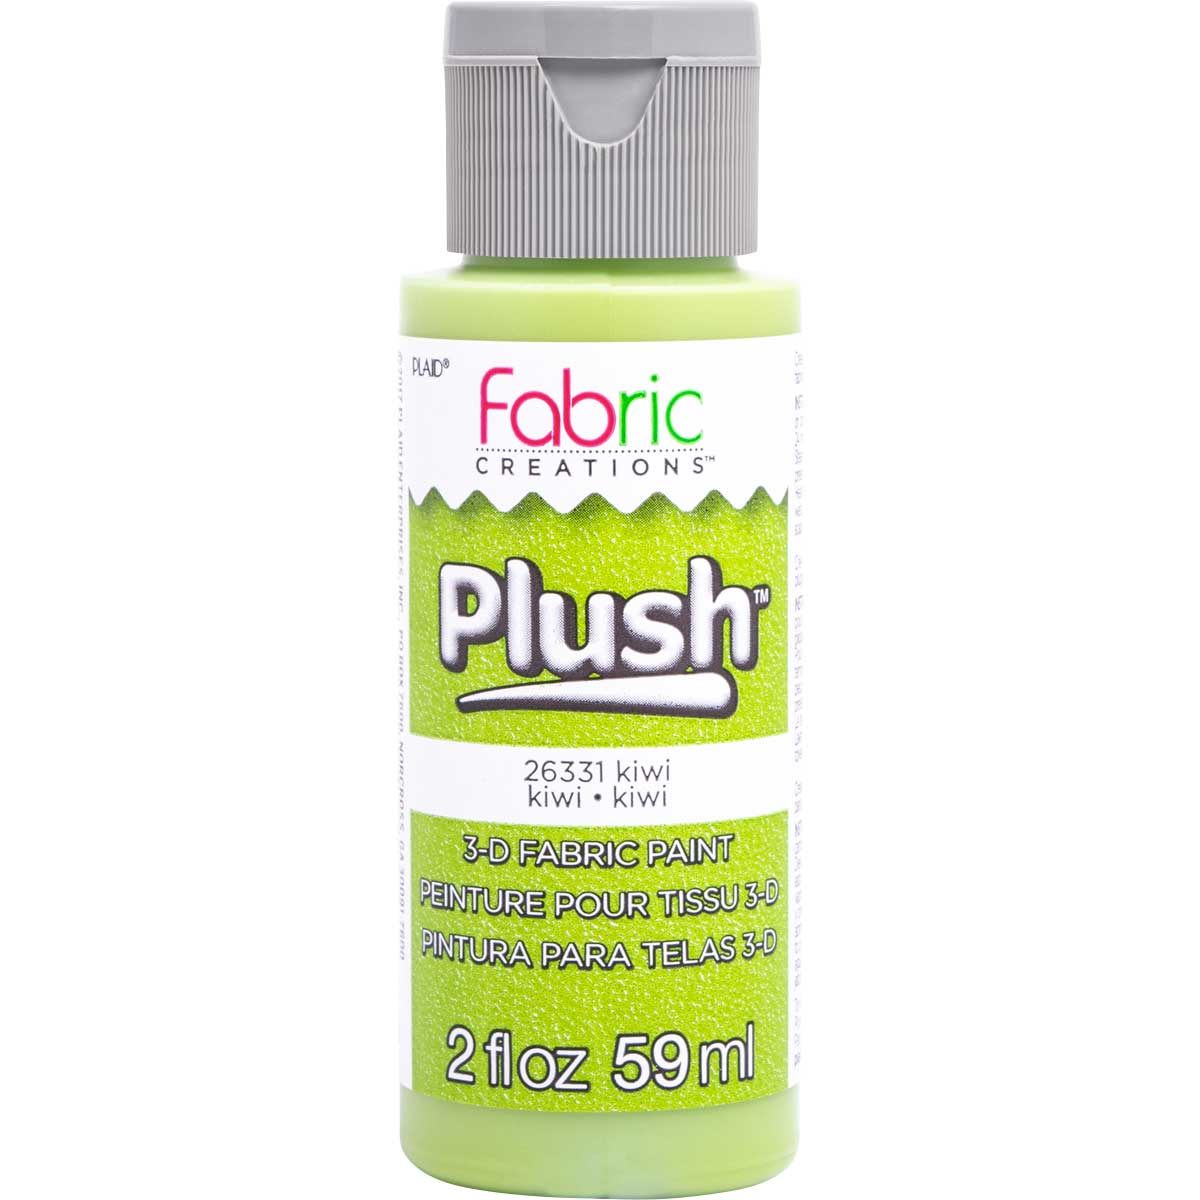 Fabric Creations™ Plush™ 3-D Fabric Paints - Kiwi, 2 oz.